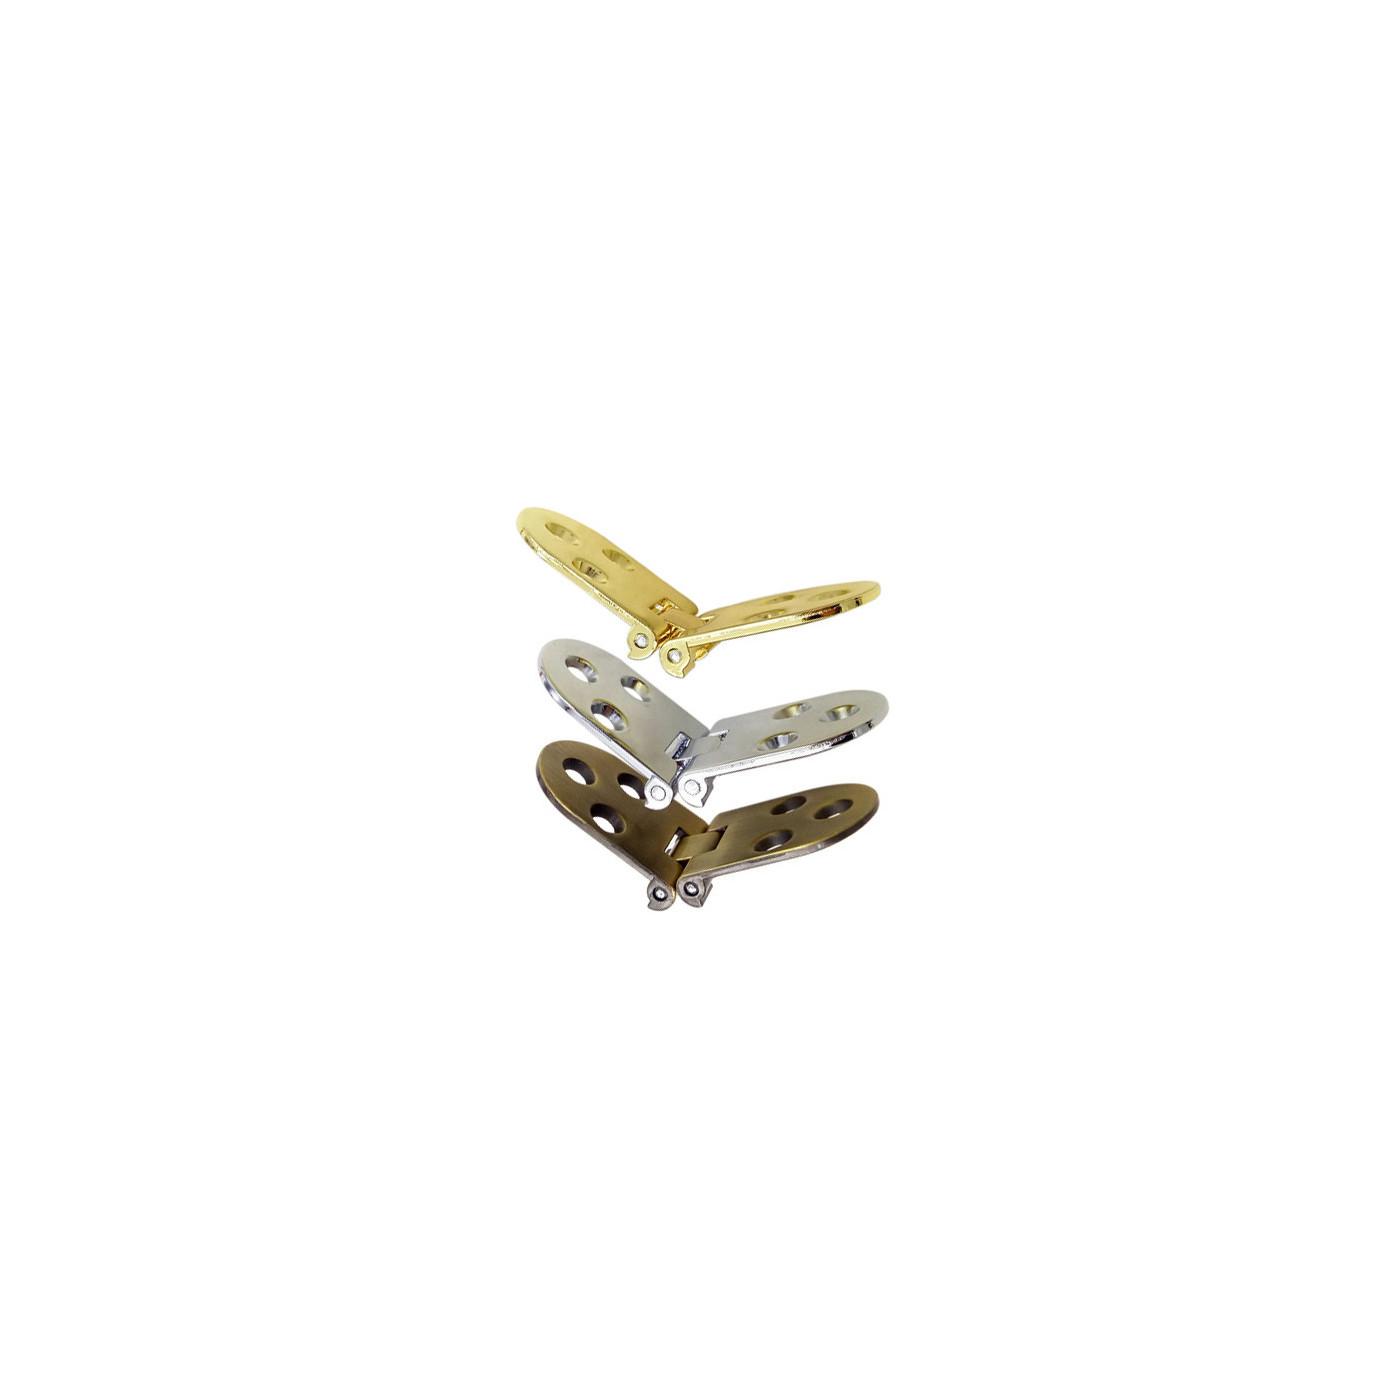 Jeu de 4 charnières métalliques robustes (30x78 mm, 180 degrés, chrome)  - 1